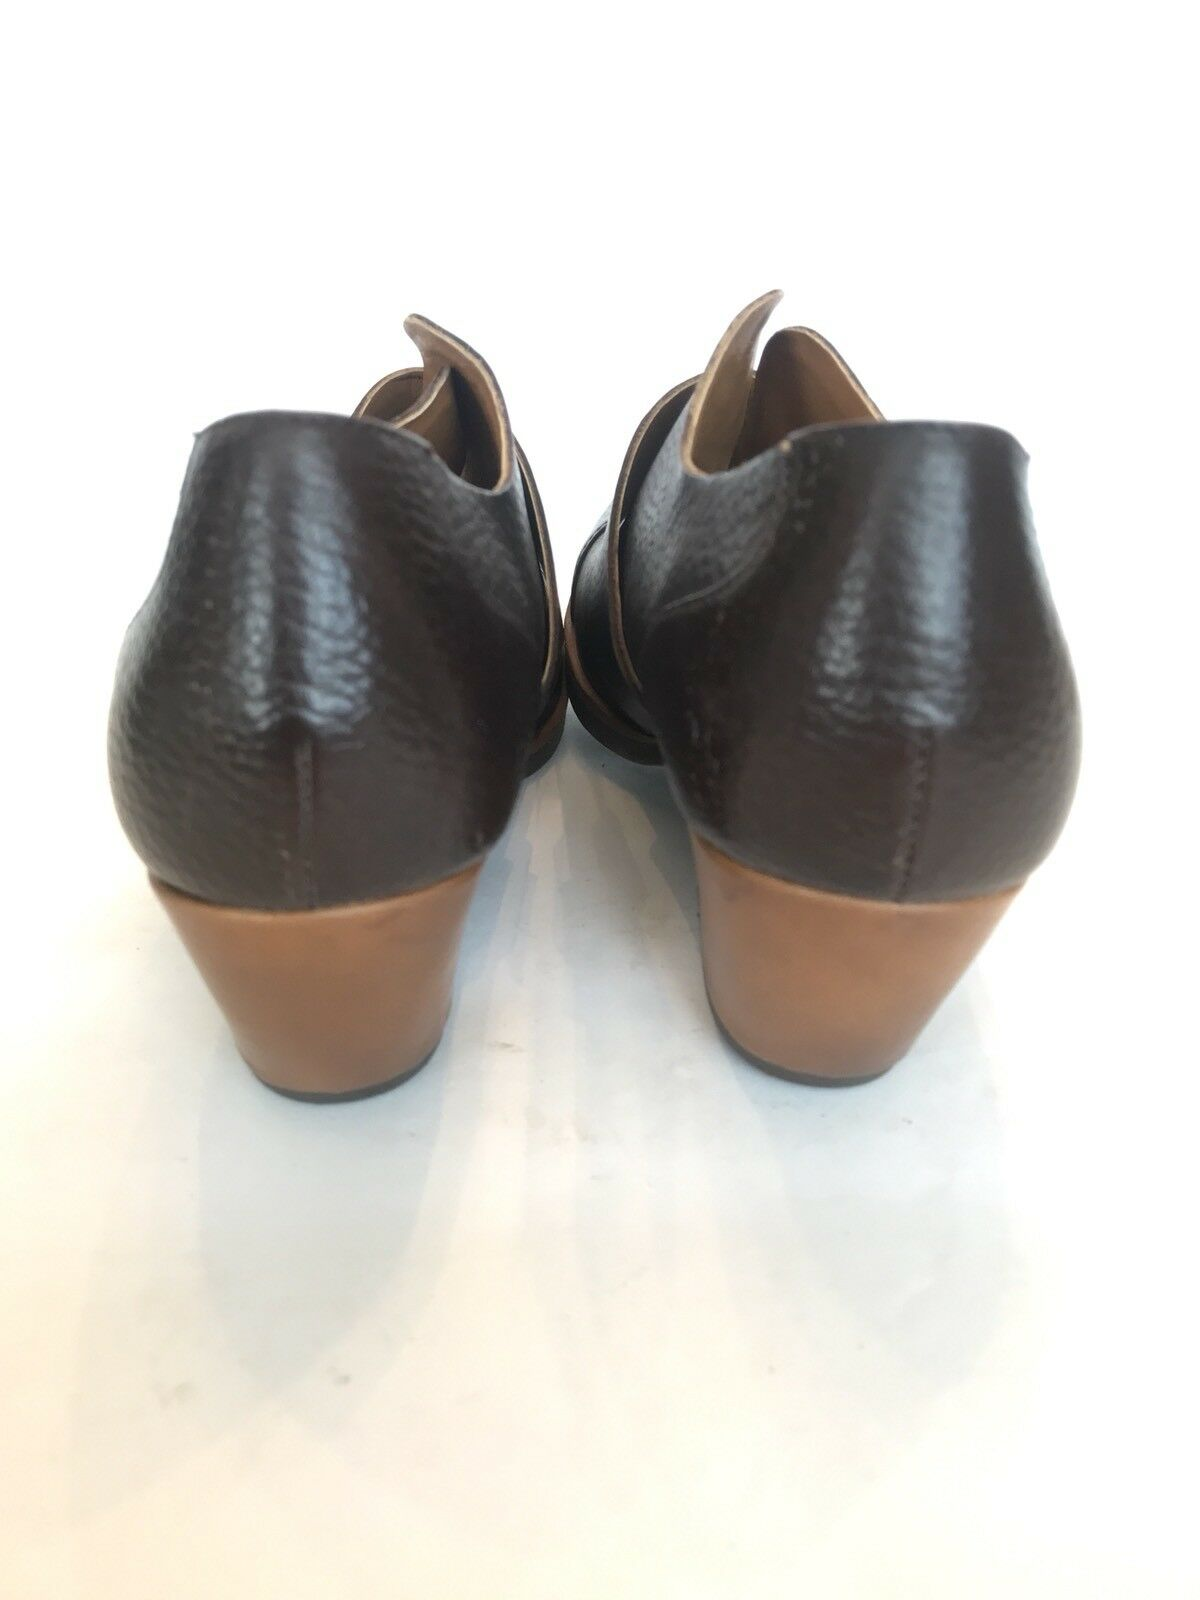 KORKS by Kork Kork Kork Ease damen braun Leather Heeled Buckled Ankle Stiefel sz 7.5 fb063a